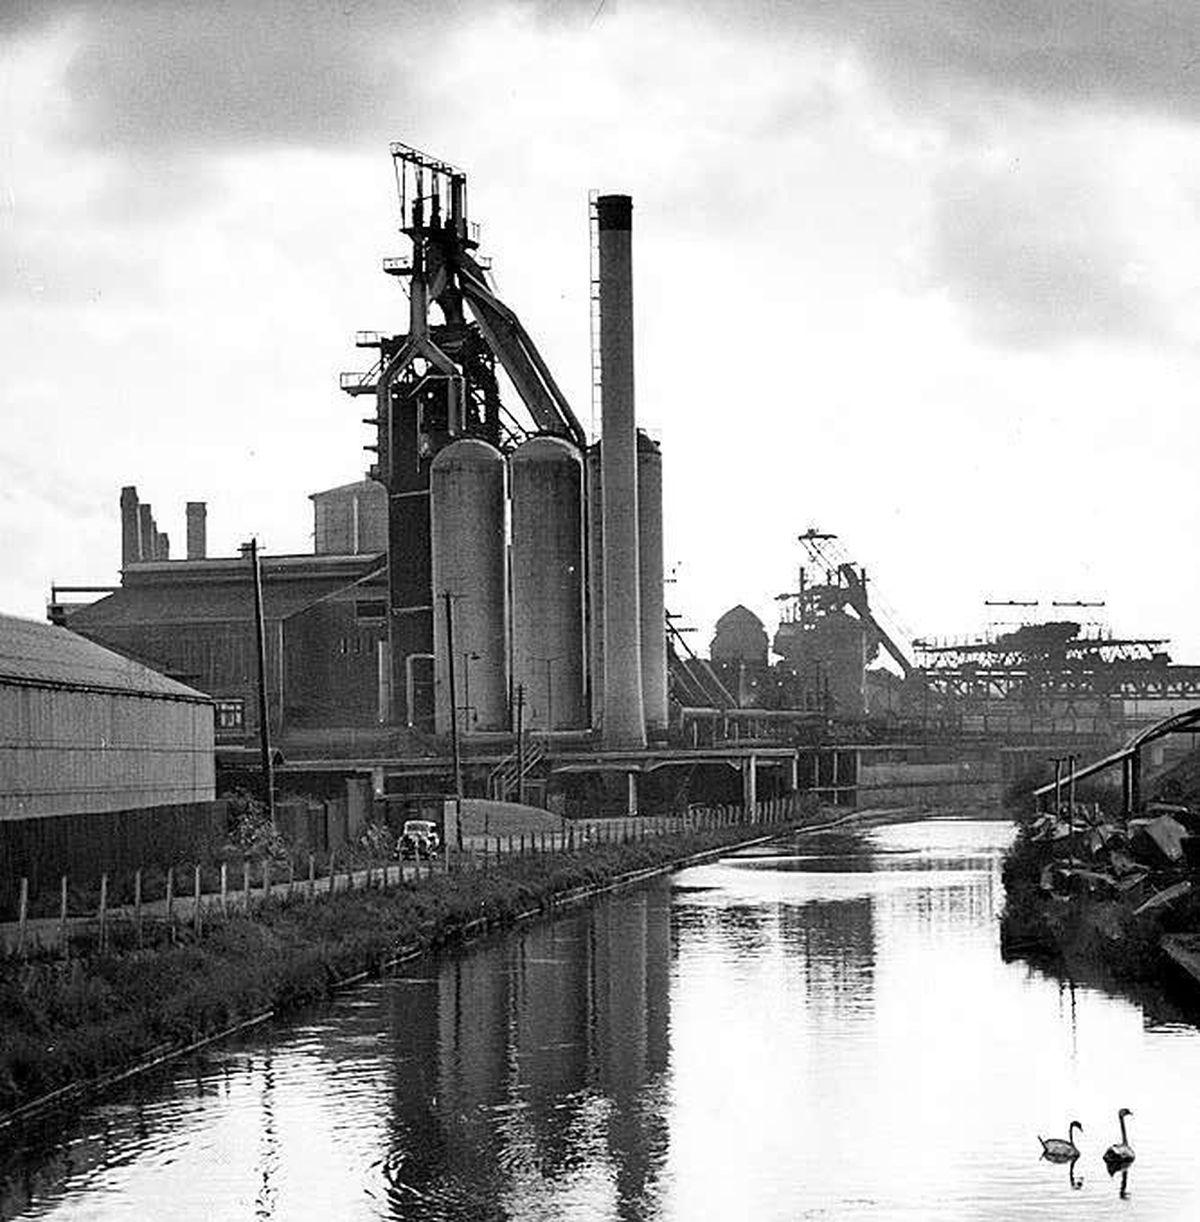 Bilston steel works pictured in 1959